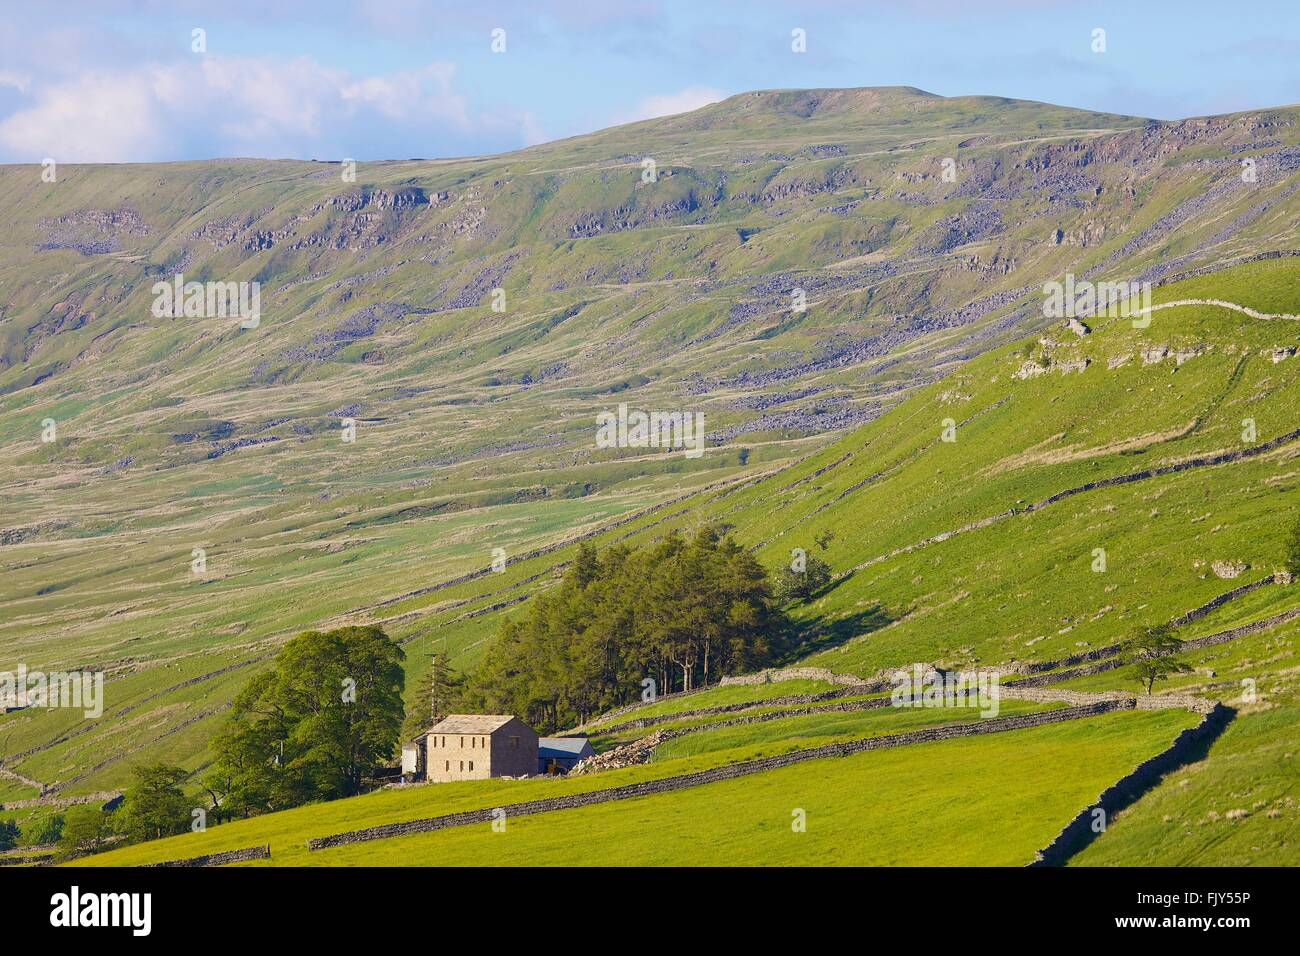 Yorkshire Dales National Park. Barn conversion on hillside. Hawes, Yorkshire, England, United Kingdom, Europe. - Stock Image